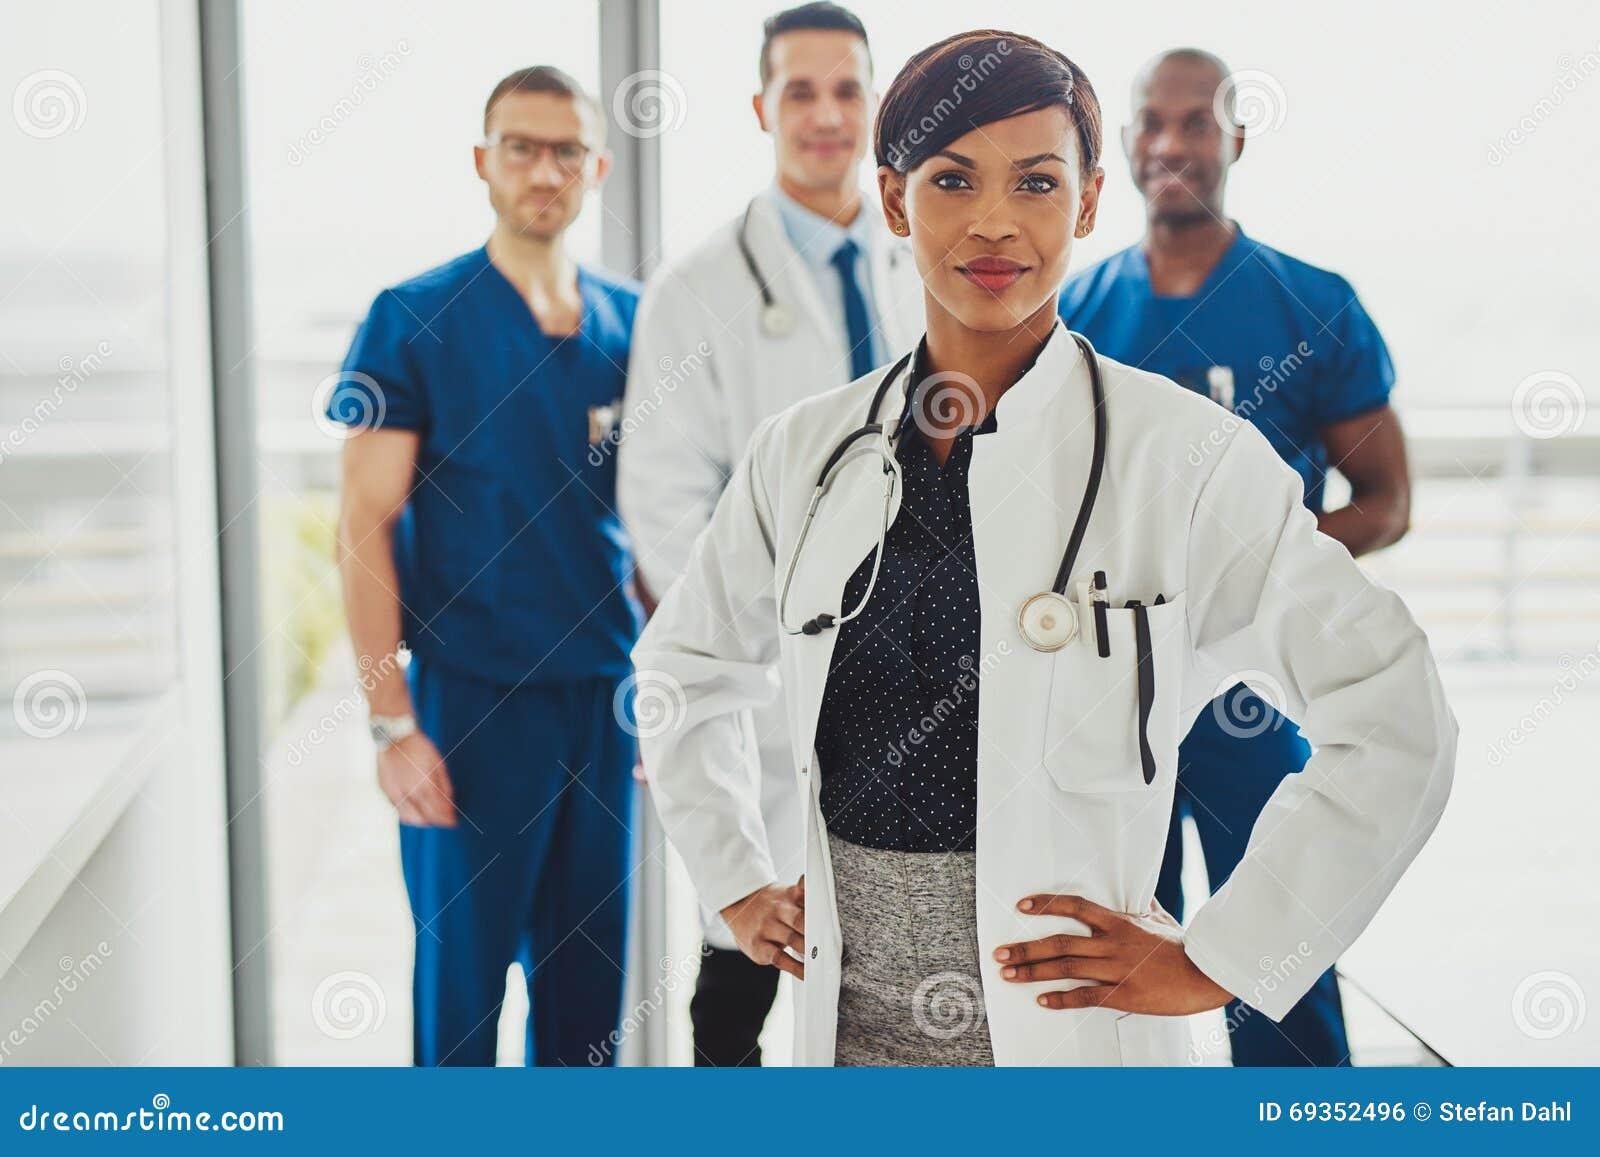 Black female doctor leading medical team